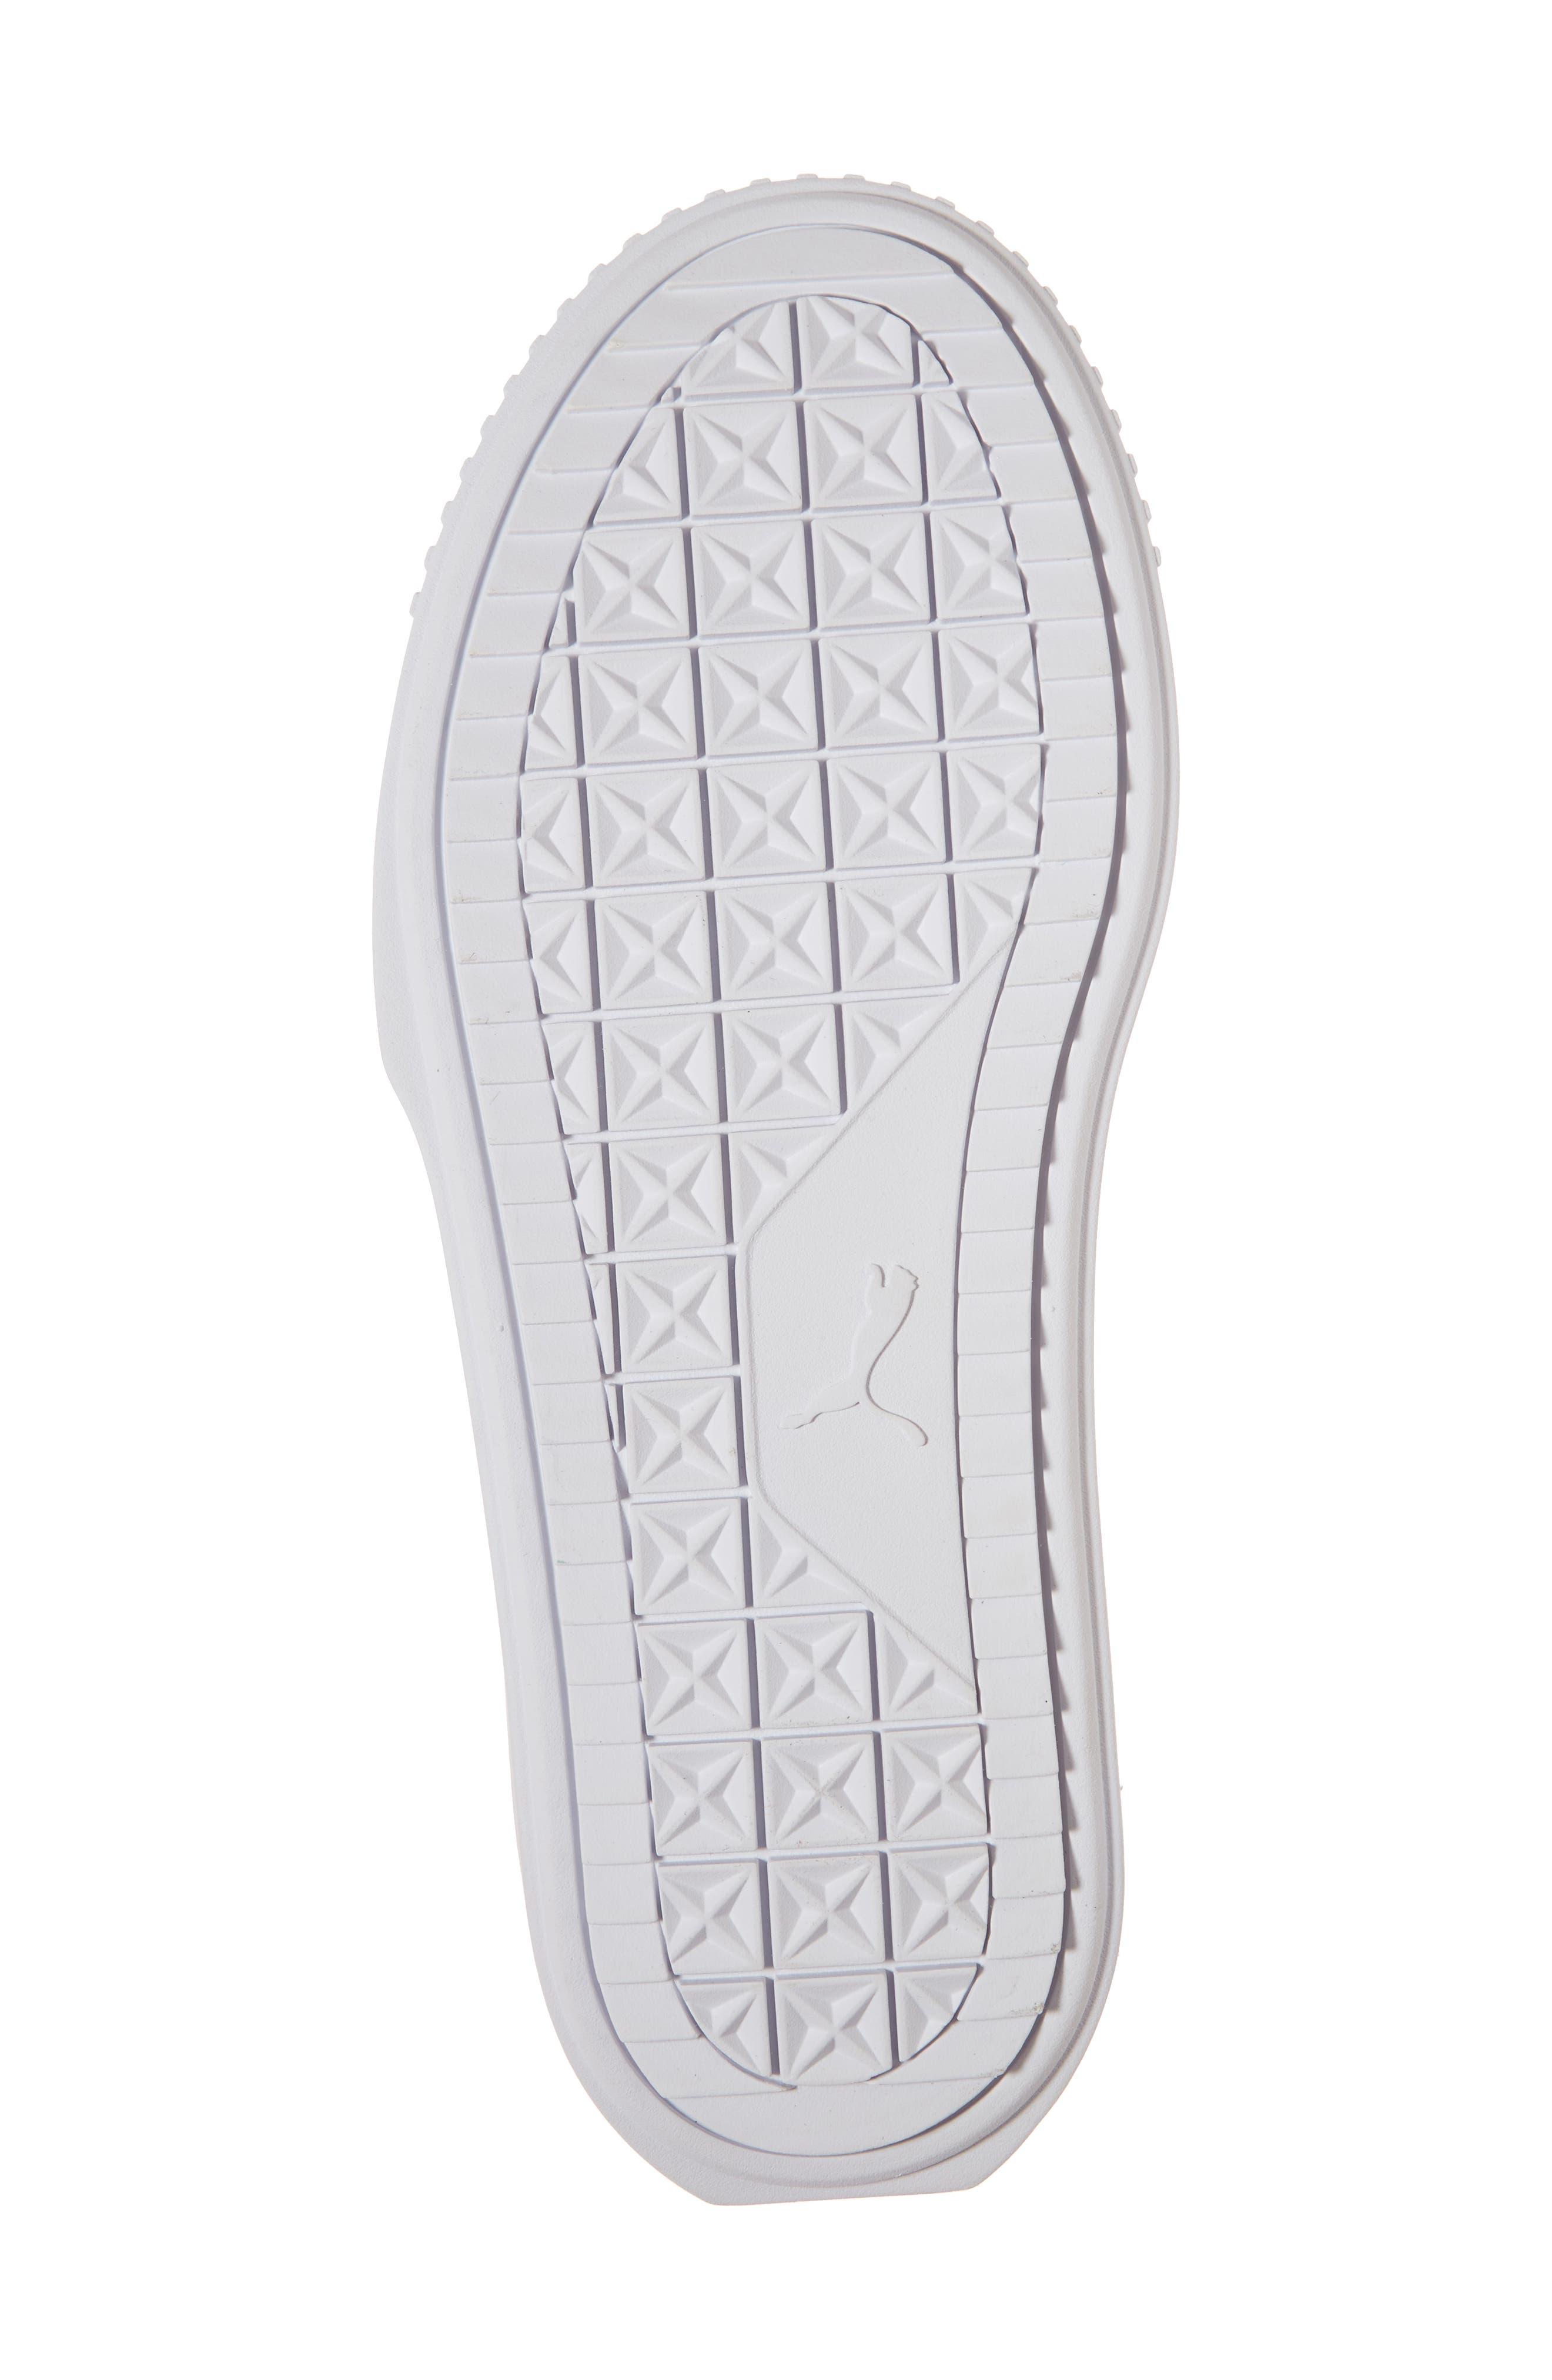 Breaker Mesh Sneaker,                             Alternate thumbnail 6, color,                             Ash/ White Suede